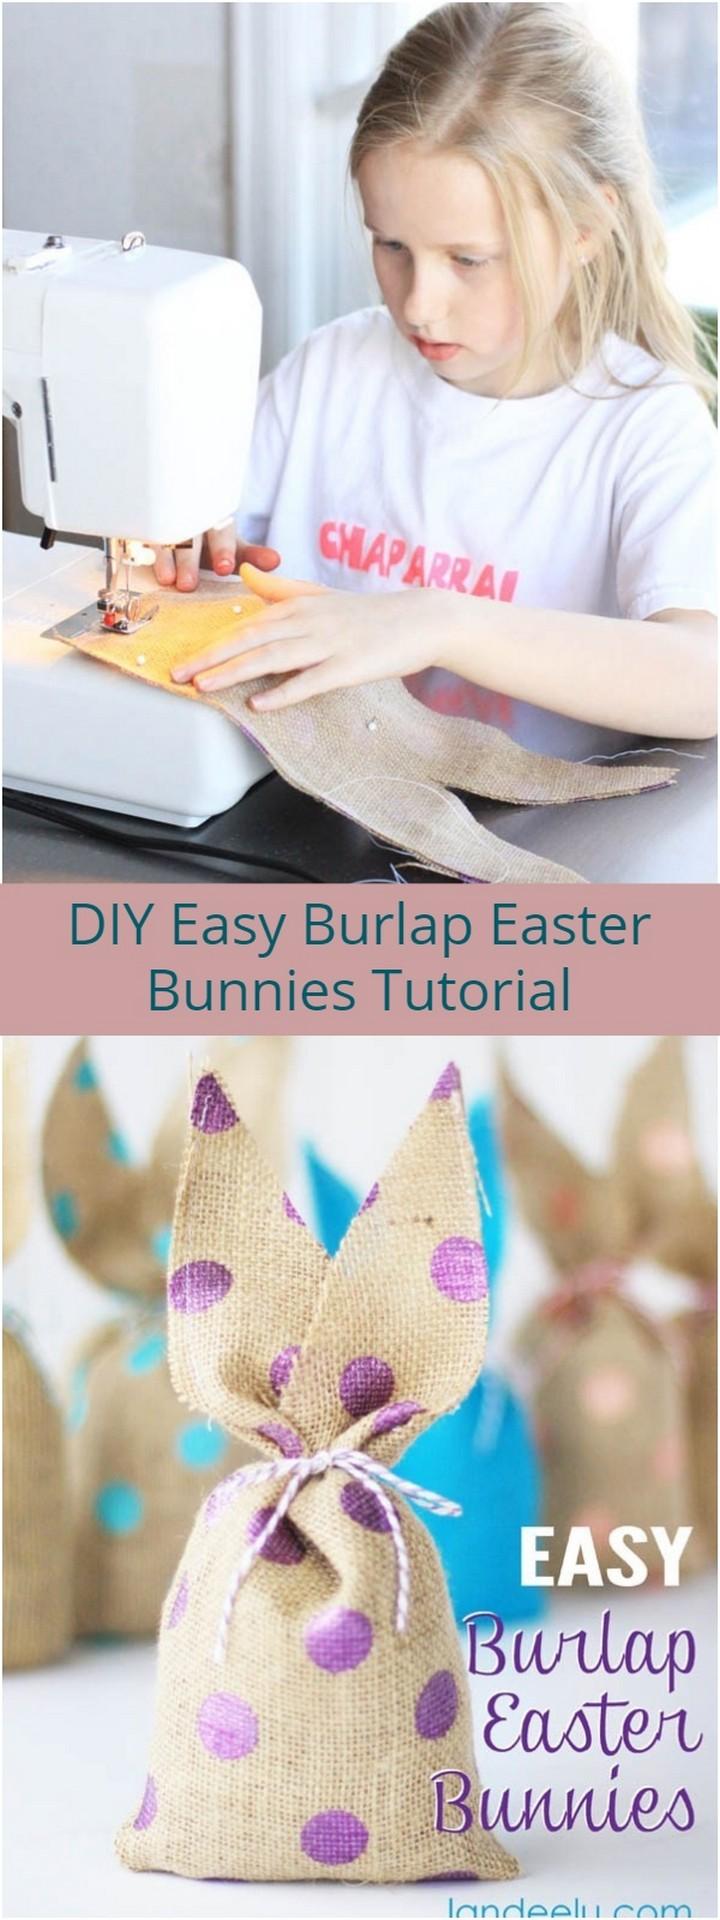 DIY Easy Burlap Easter Bunnies Tutorial 1